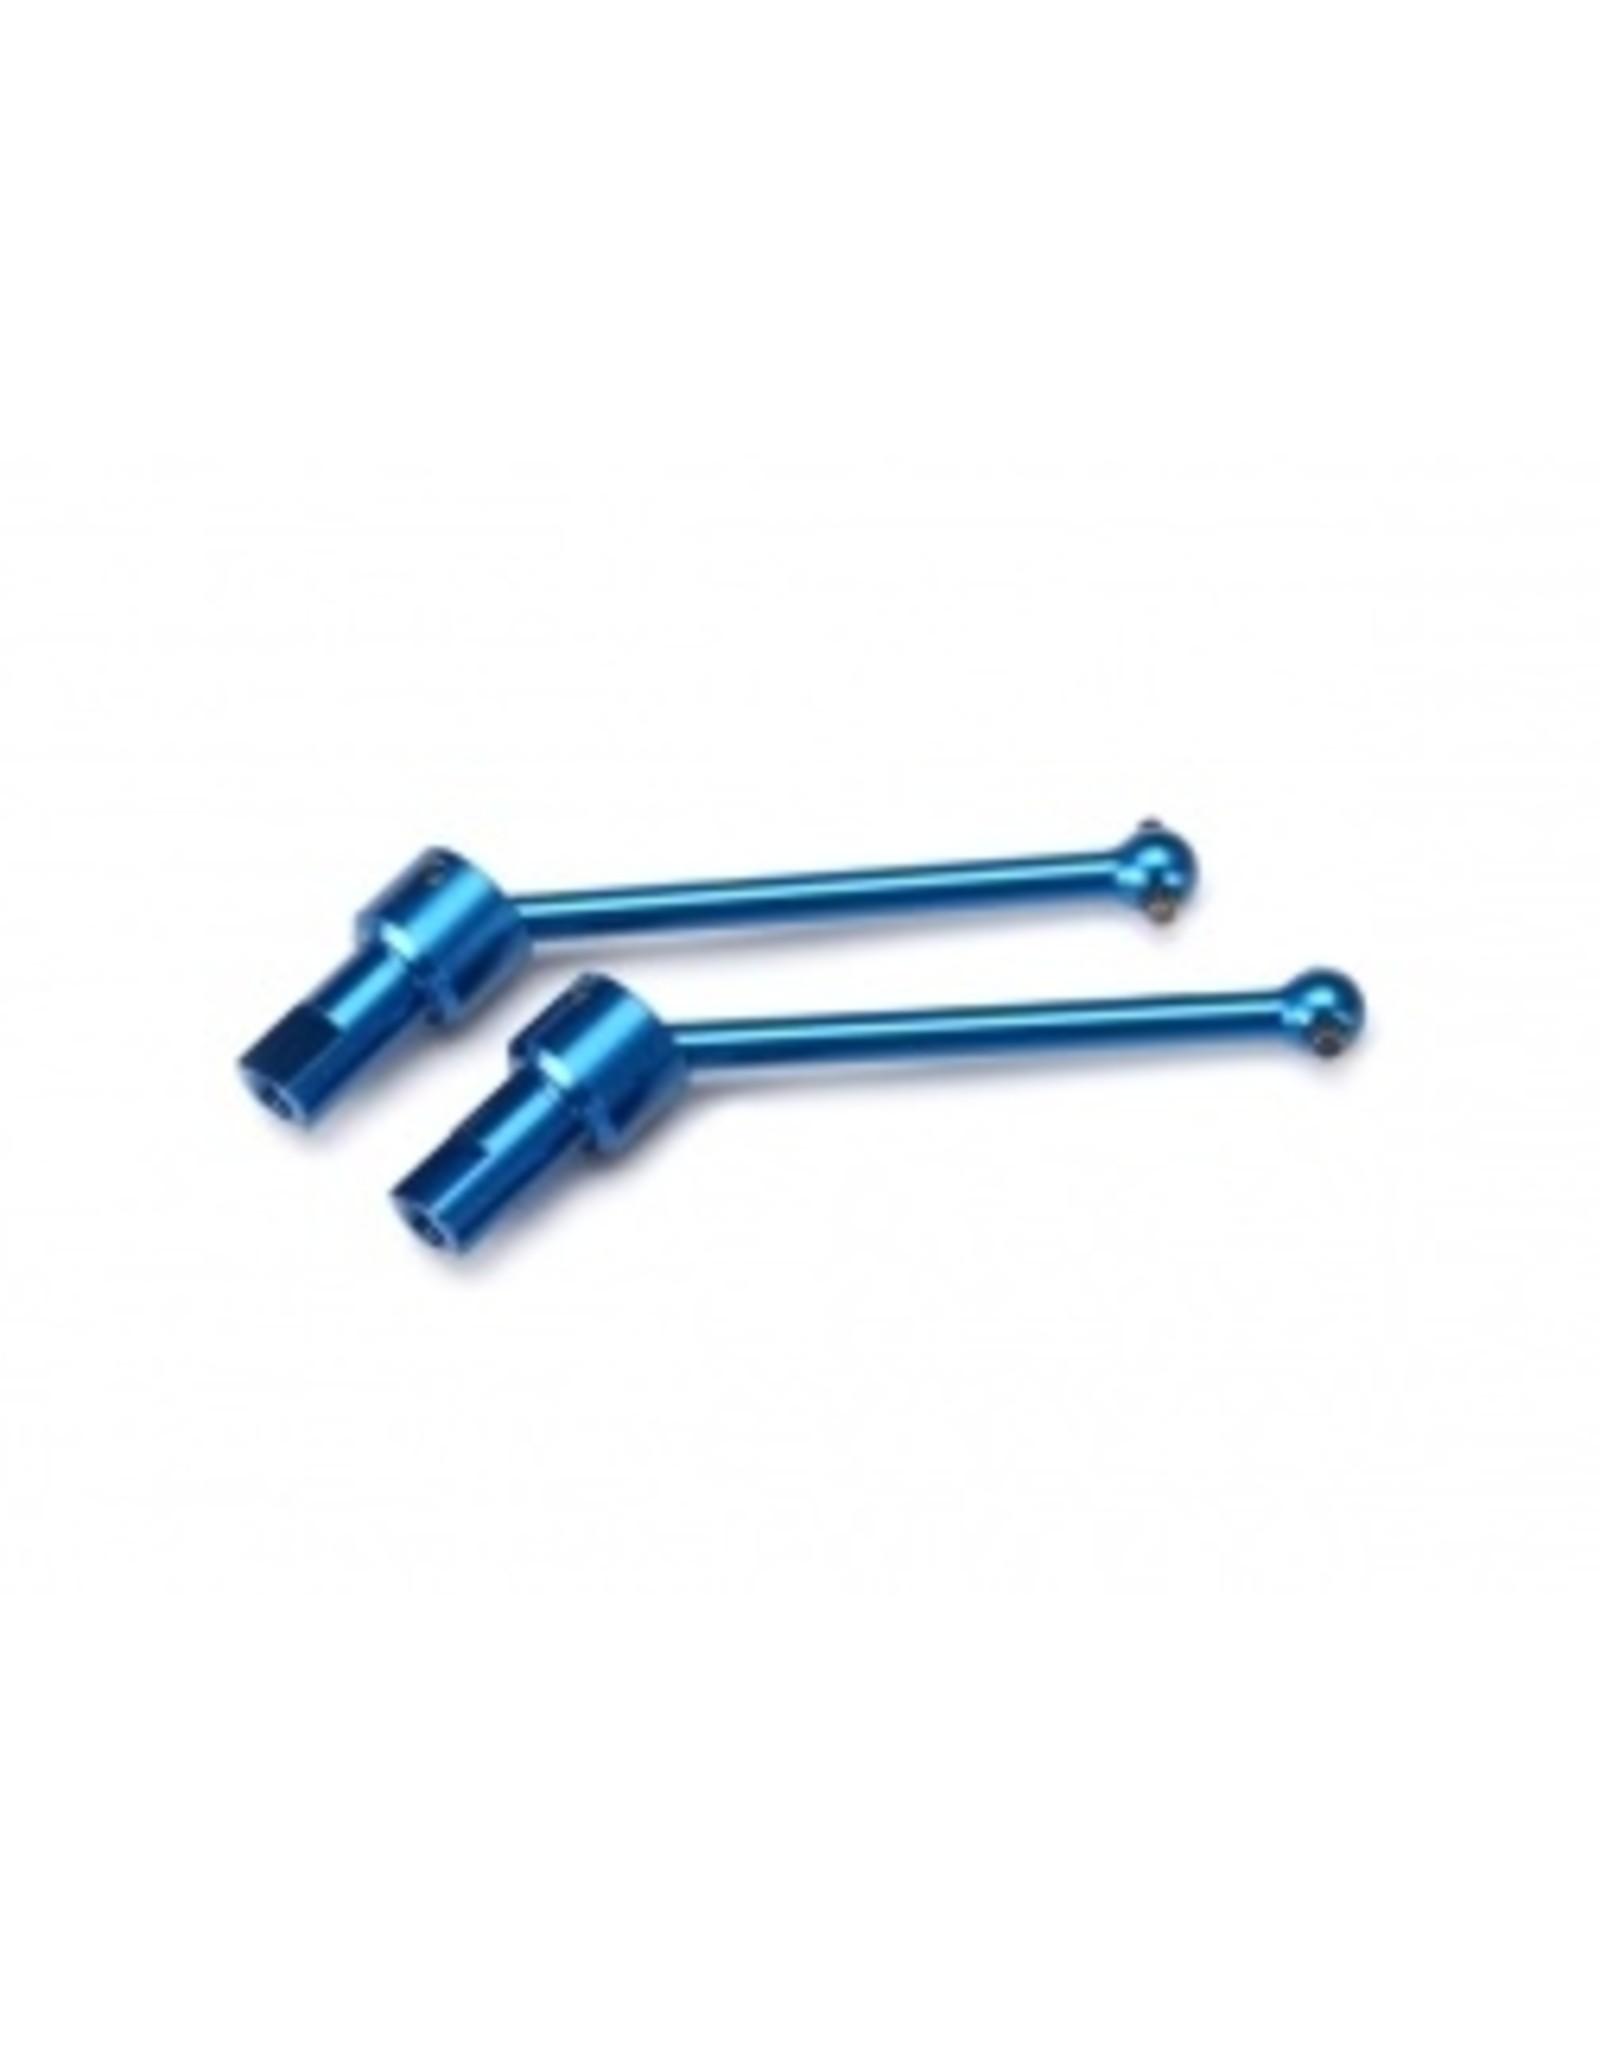 Traxxas Driveshaft assembly, front & rear, aluminum (blue) (2) (Teton/Pre) (7650R)